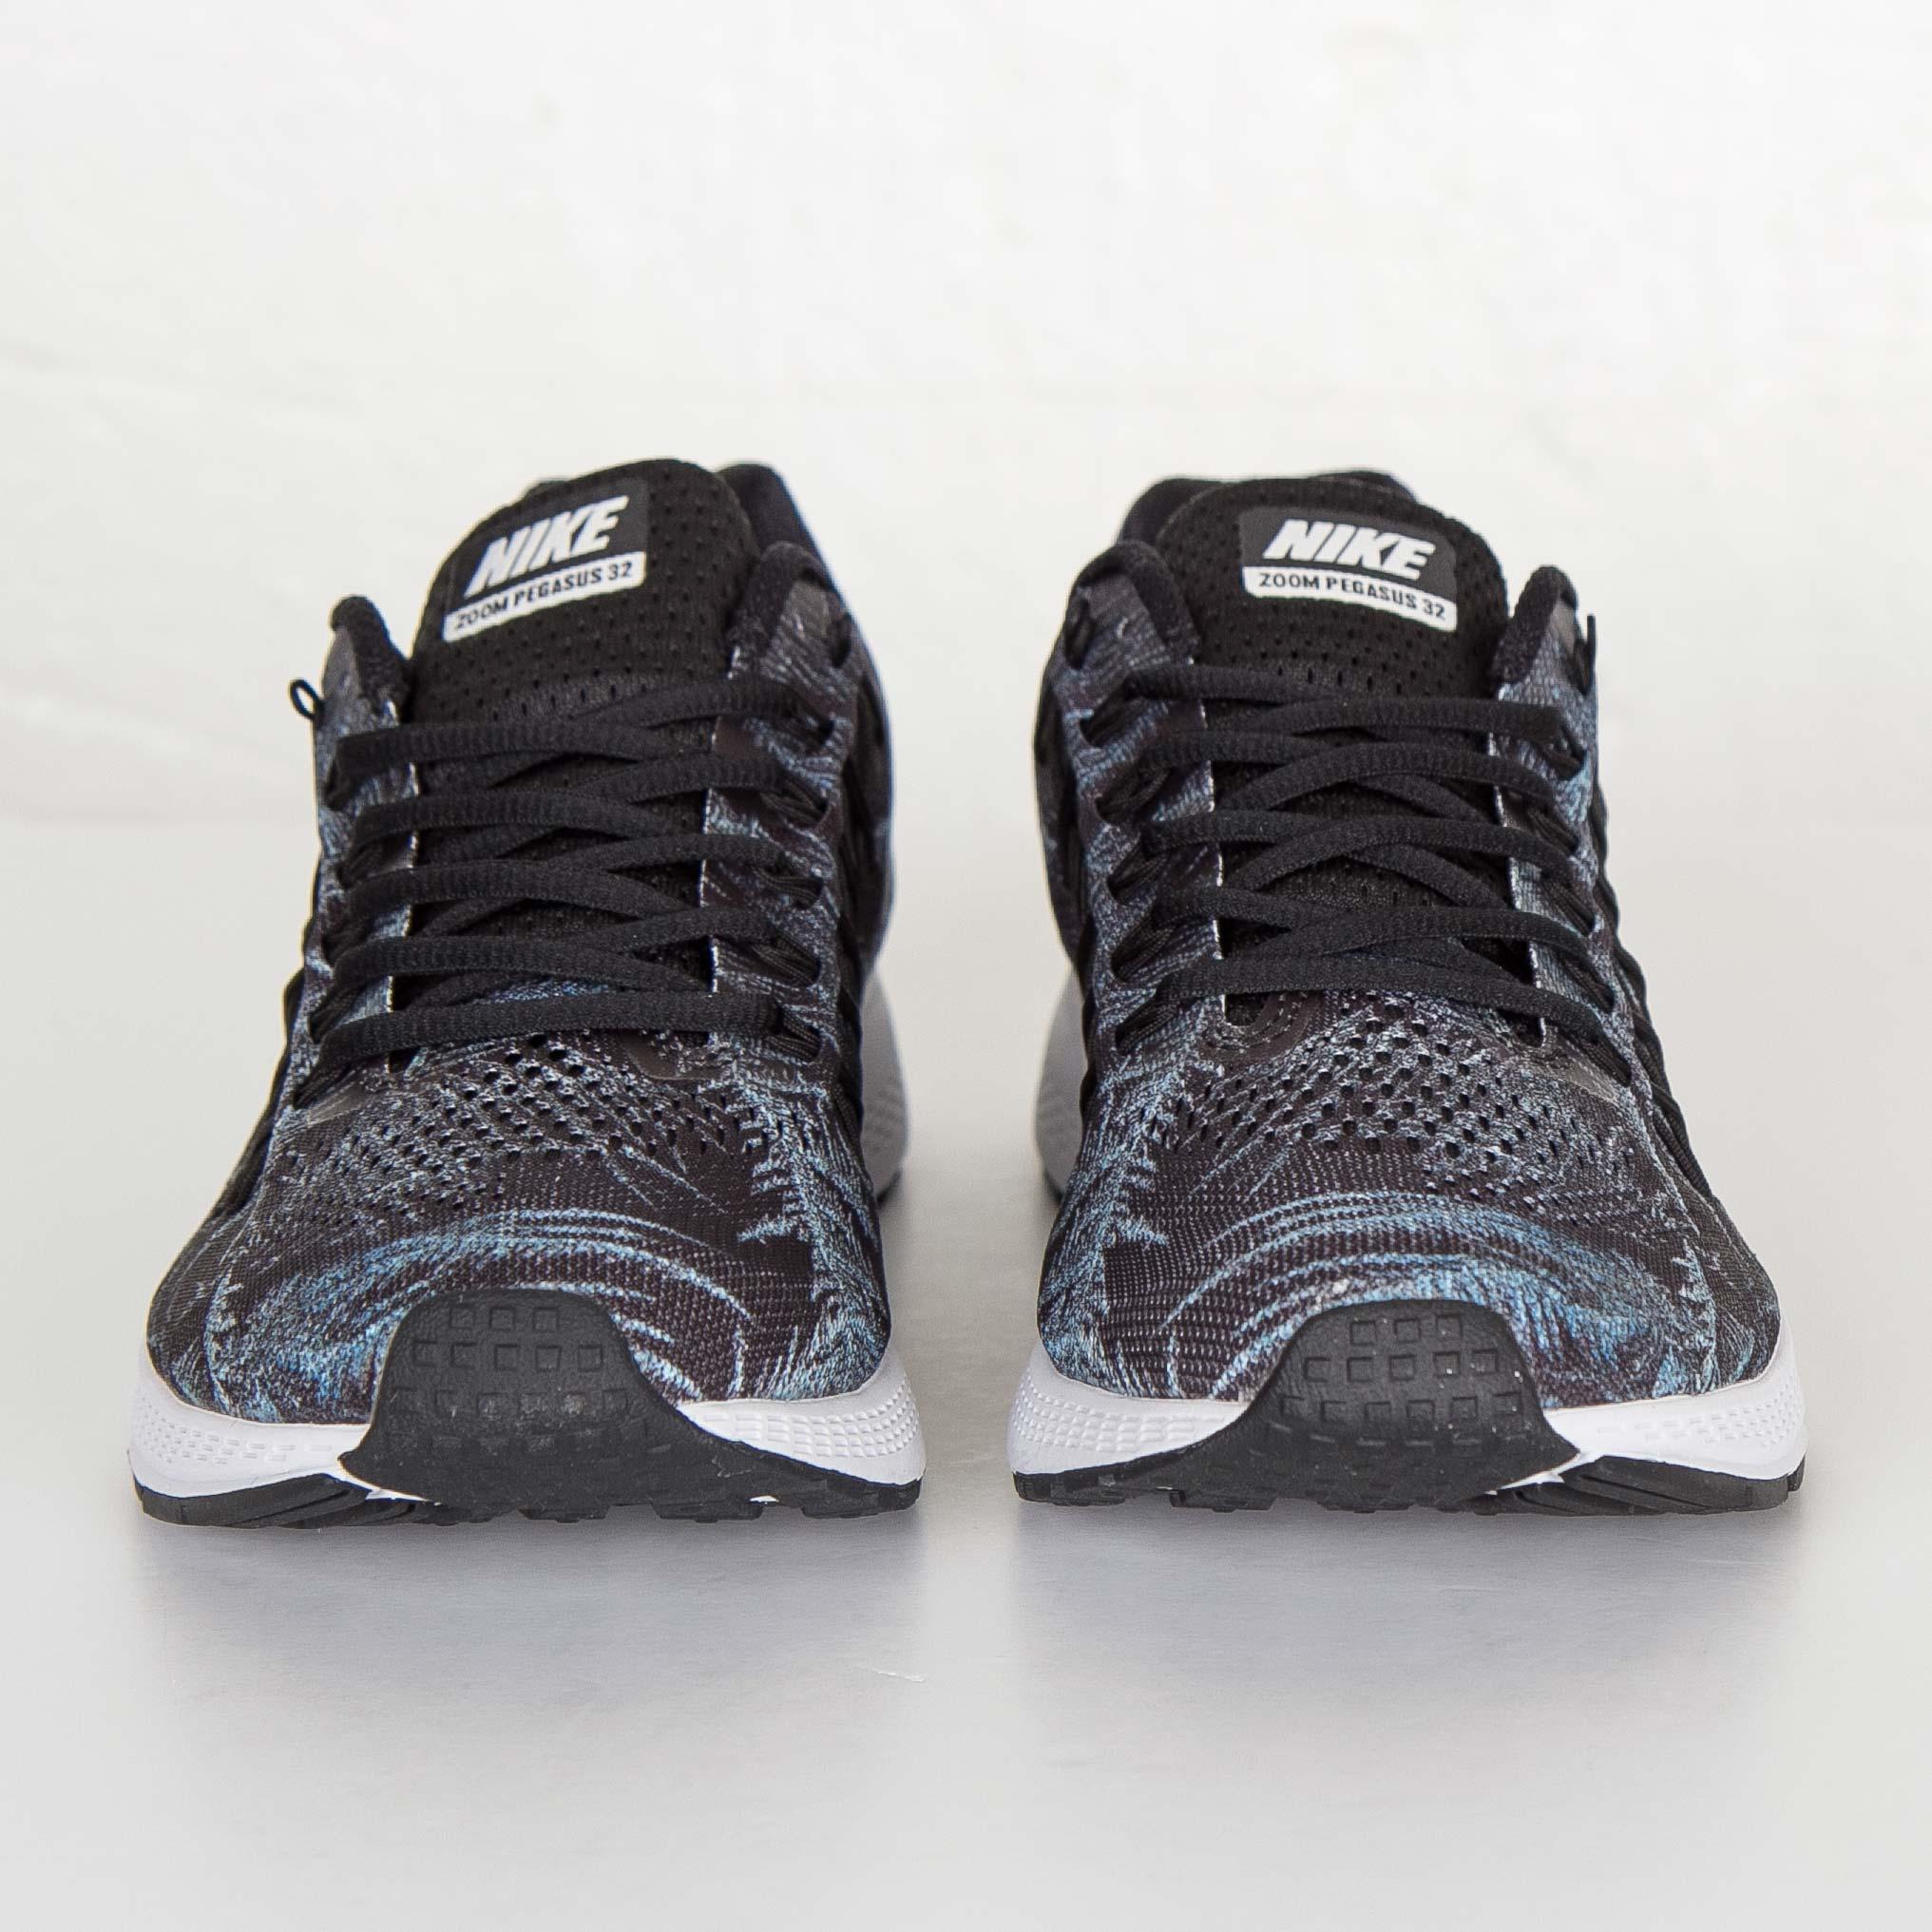 meilleur site web 1f94f bd46c Nike Air Zoom Pegasus 32 Solstice - 805938-001 ...